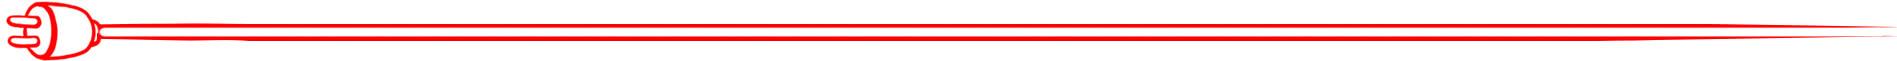 Strompreis Vergleich - Kapiteltrenner rot oben